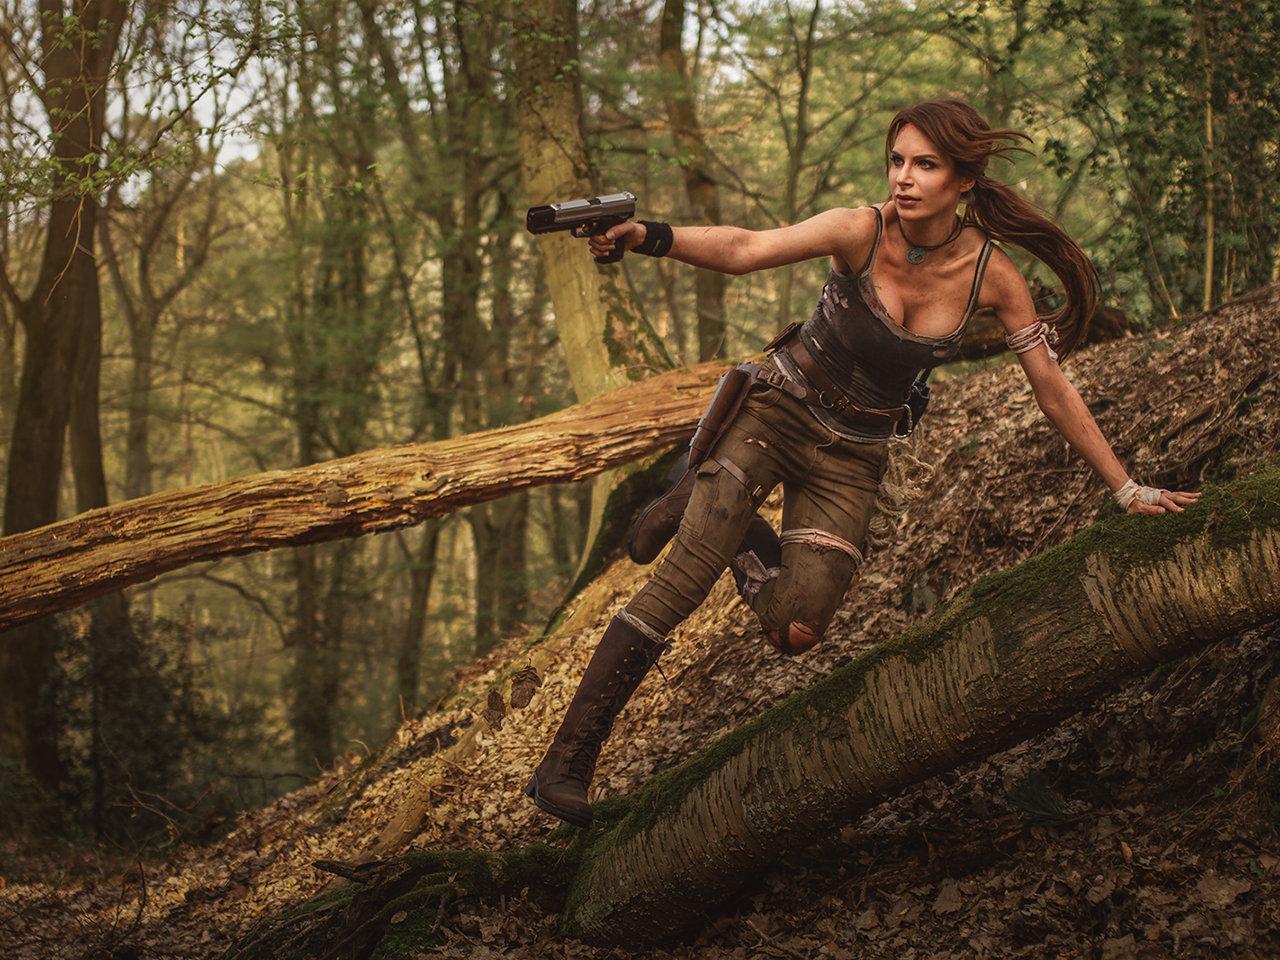 Lara Croft, Model ist Lena. Instagram: @lena_lara_cosplay Facebook: @lenalaracosplay. Photograf ist Tobias. Instagram: @schmelzertobias. Facebook: @schmelzertobias.